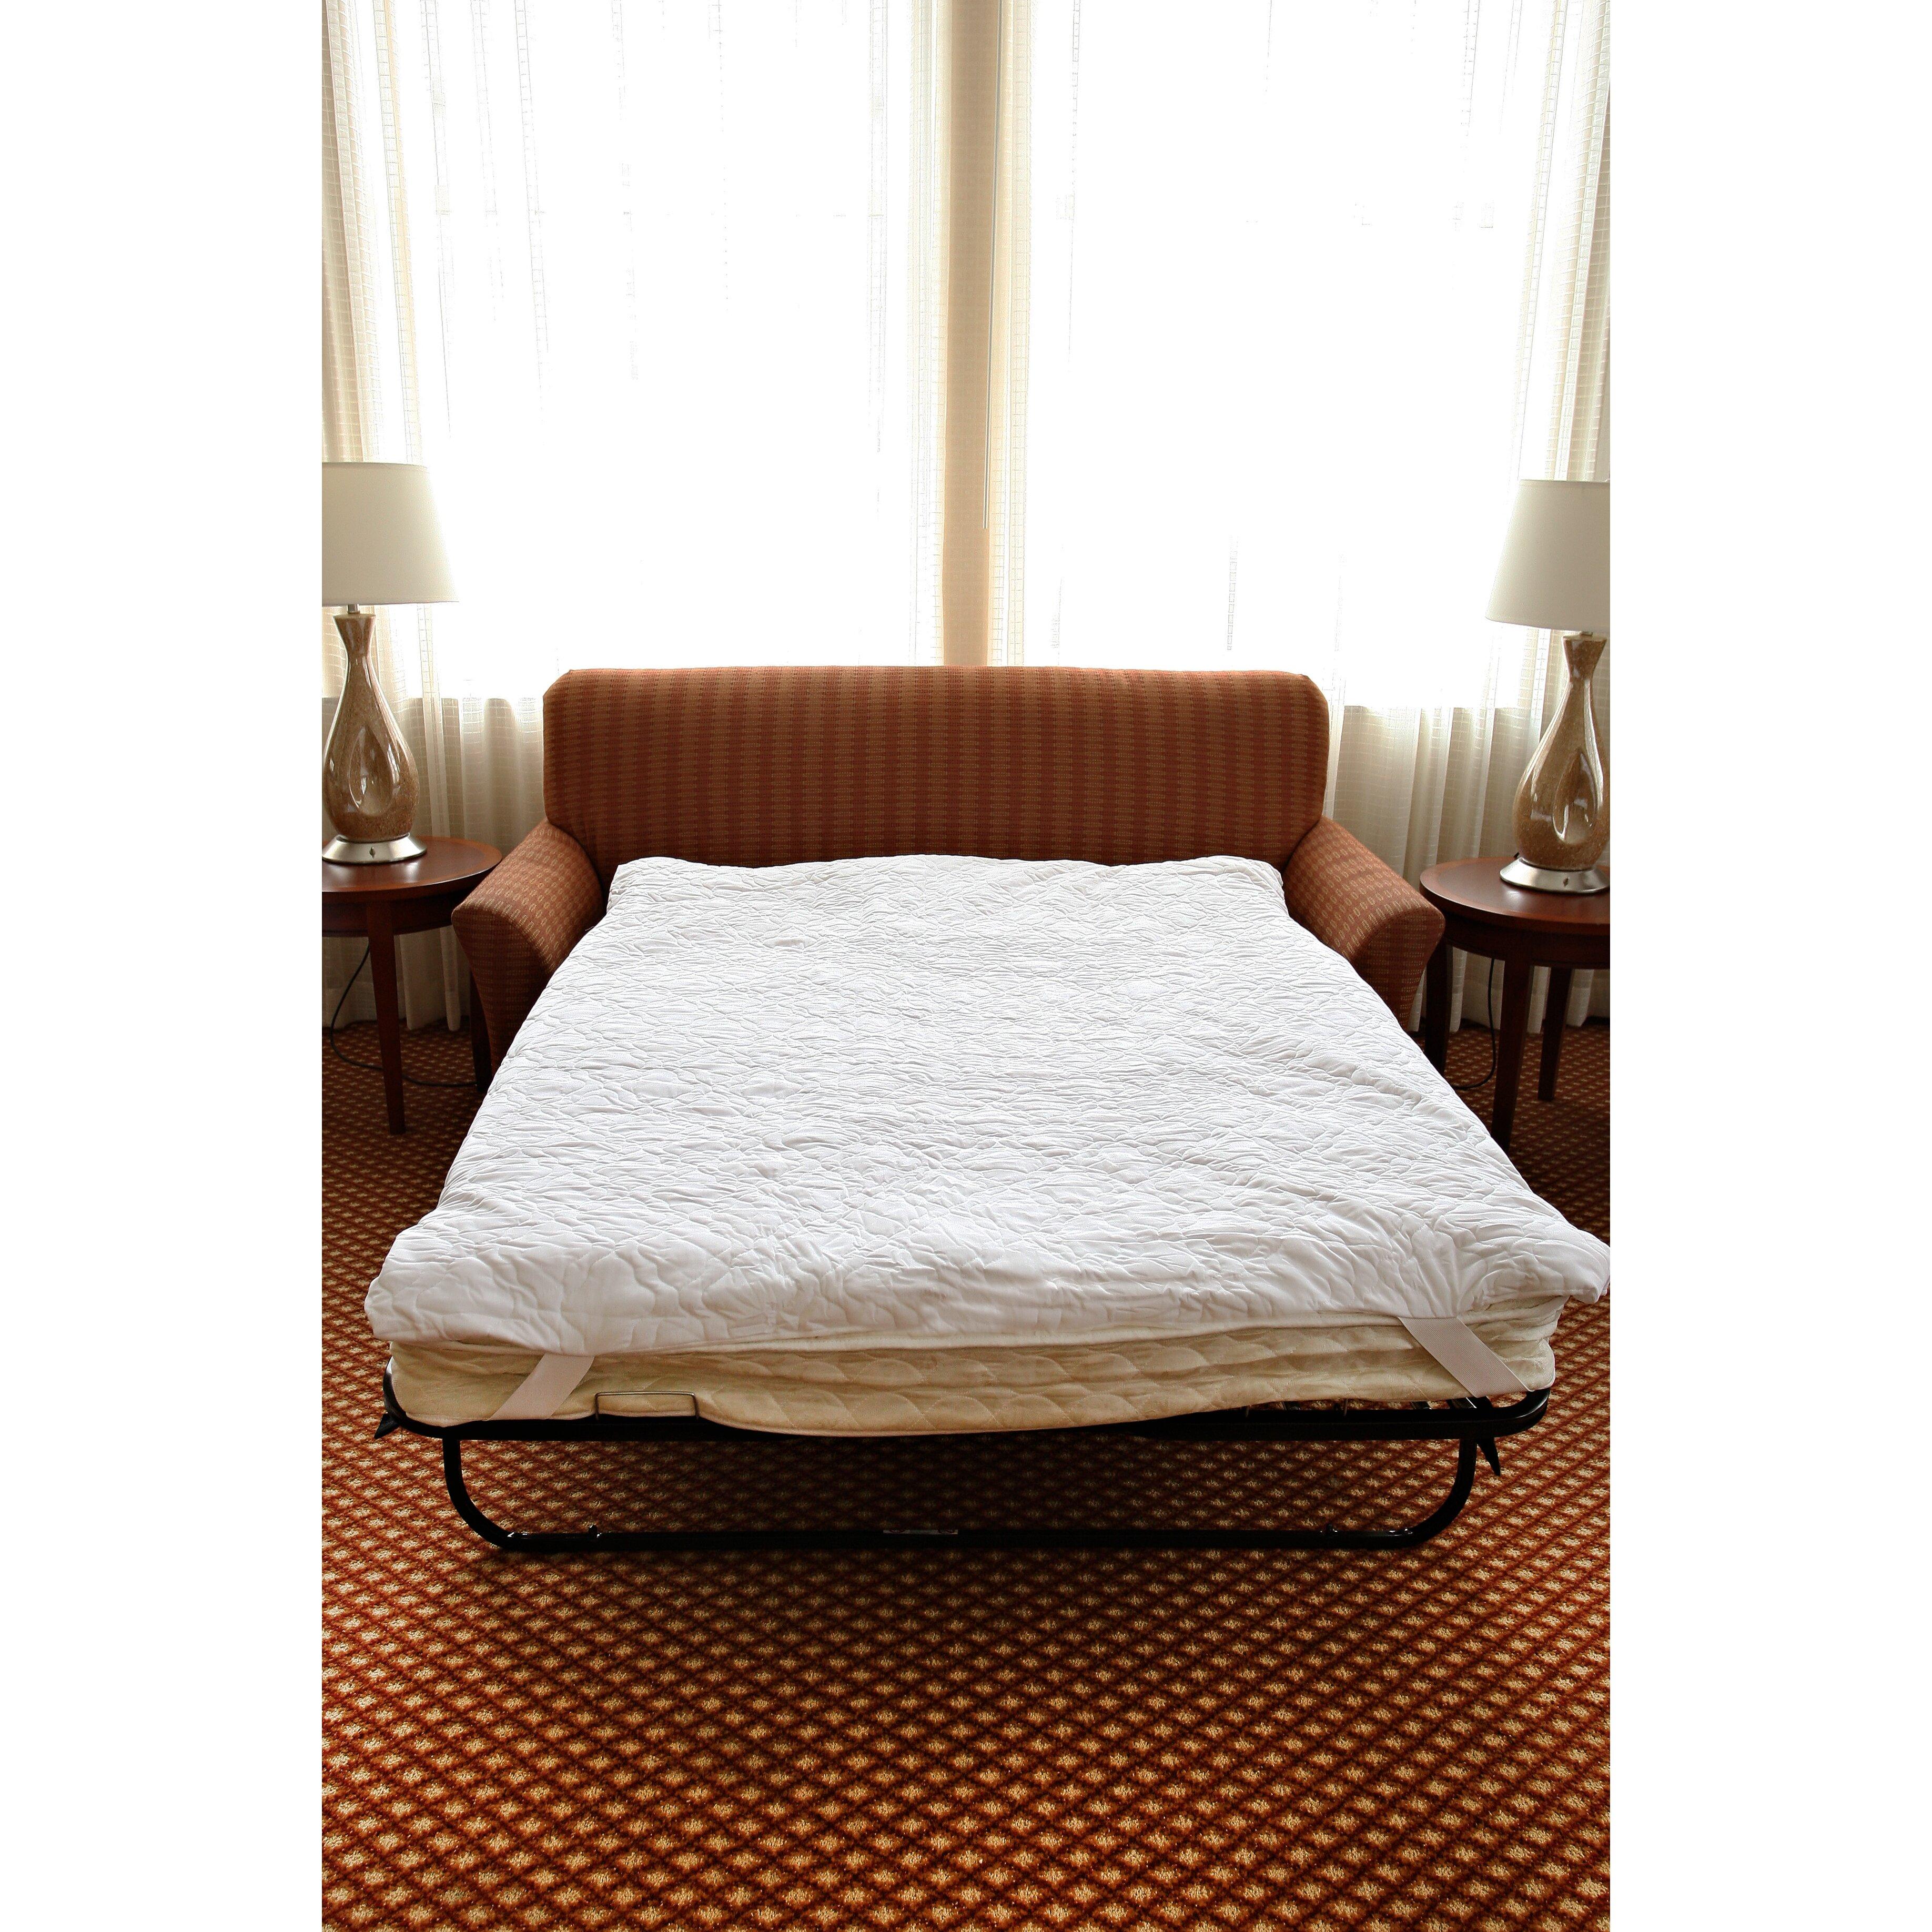 science of sleep foam sofa bed mattress pillow top reviews wayfair. Black Bedroom Furniture Sets. Home Design Ideas